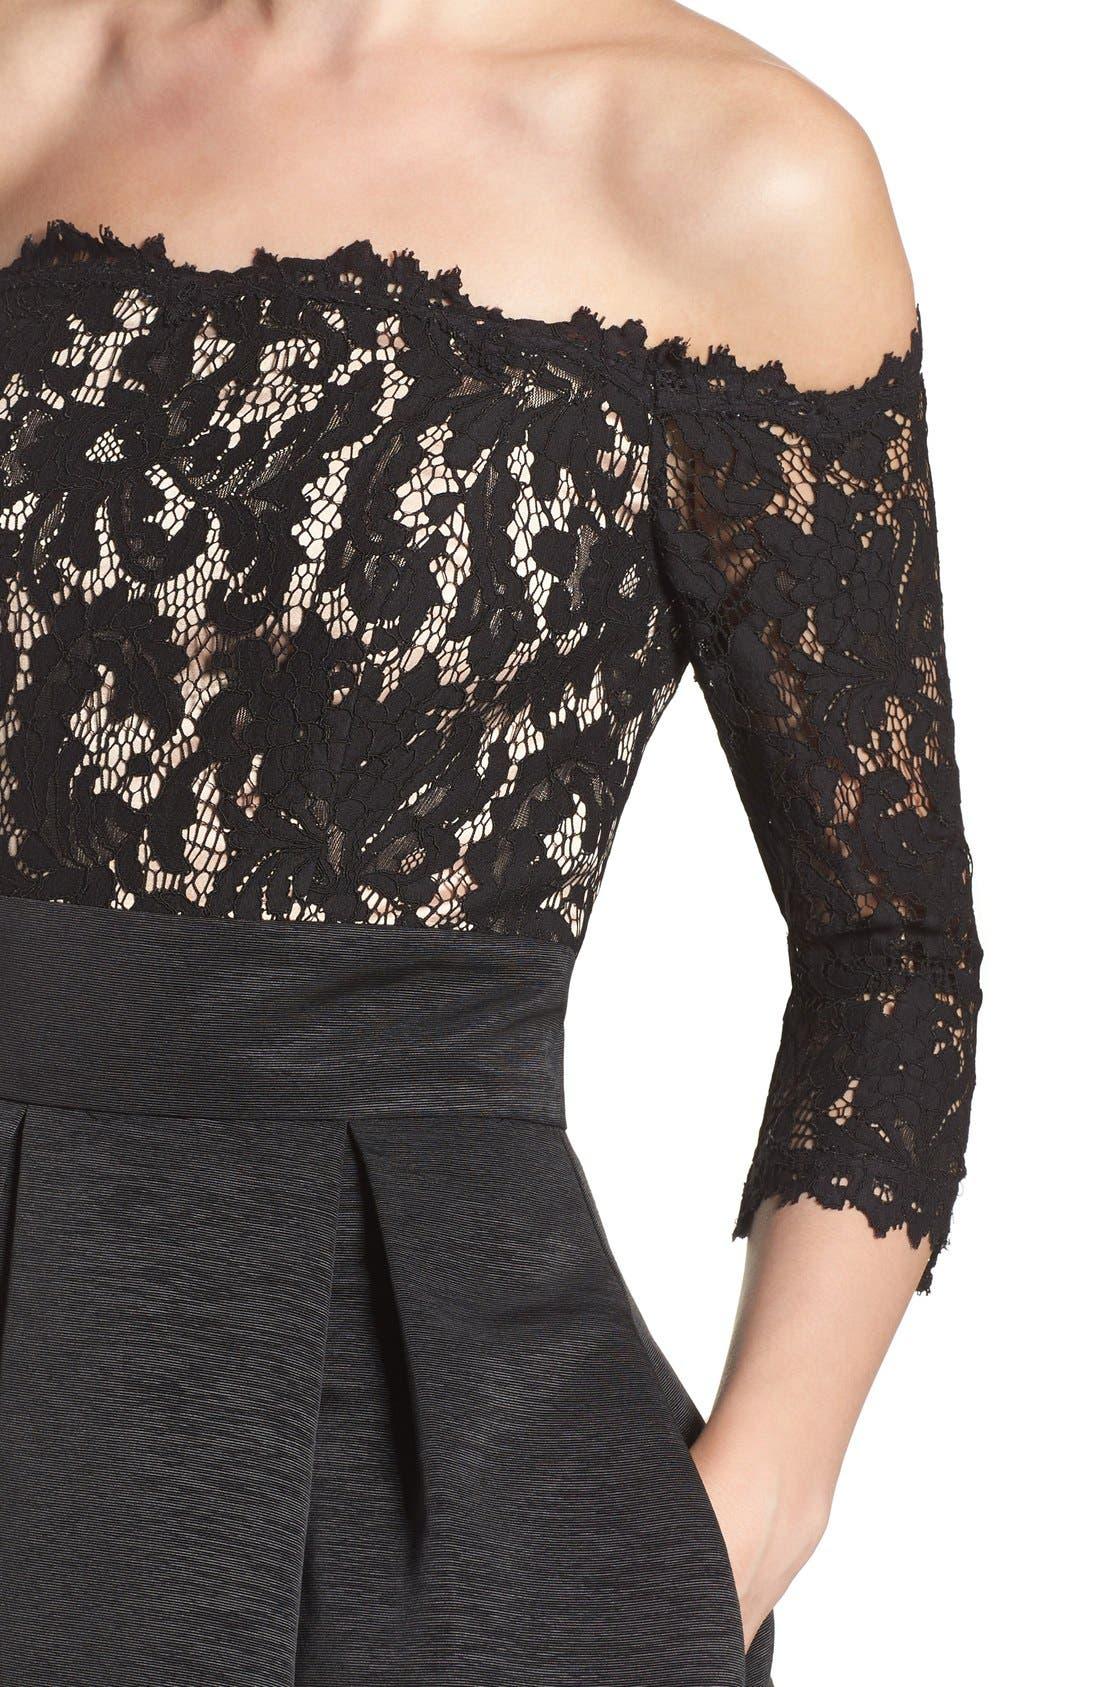 Off the Shoulder A-Line Dress,                             Alternate thumbnail 13, color,                             BLACK